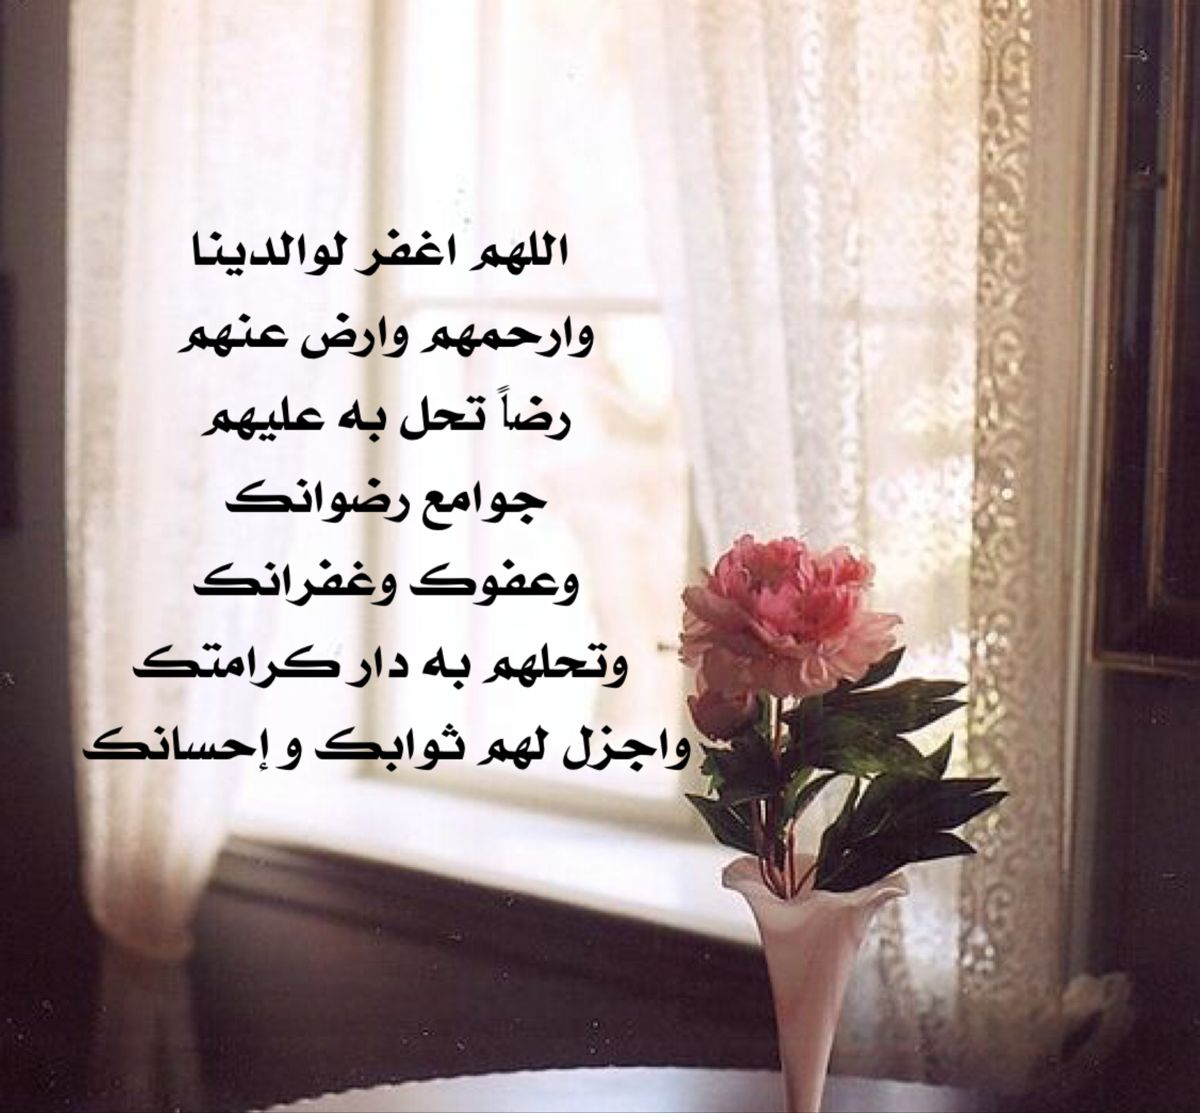 Pin By أدعية وأذكار On دعاء We Heart It Image Printed Shower Curtain